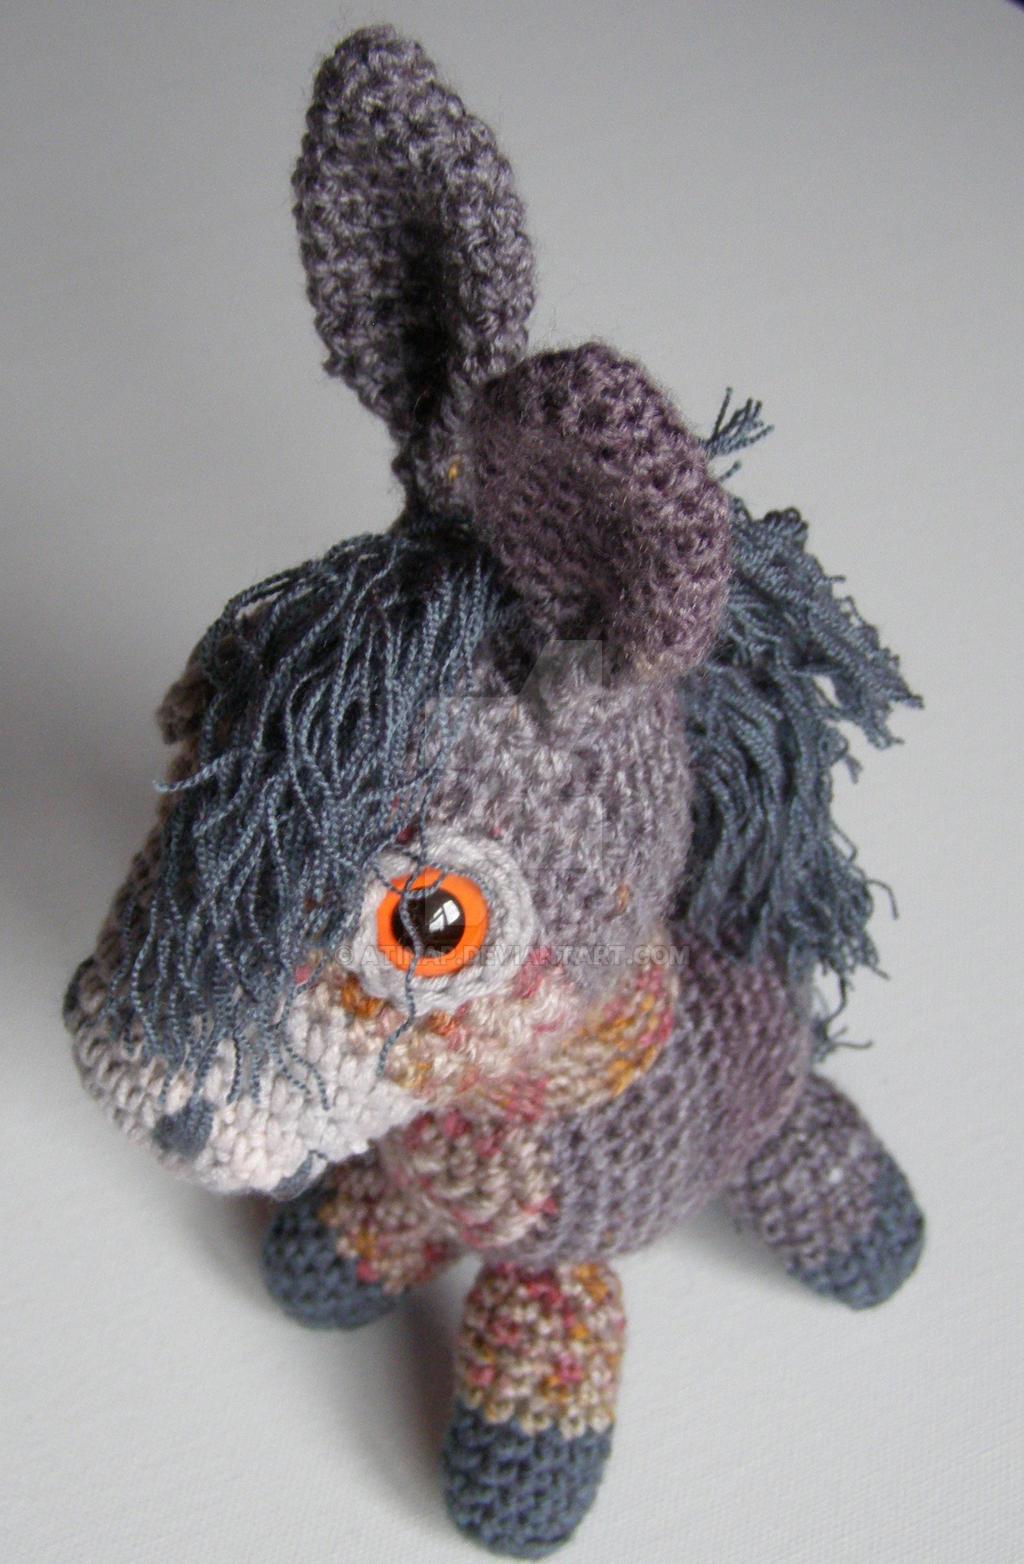 Ponytail Amigurumi : Pony Amigurumi by AtinaP on DeviantArt